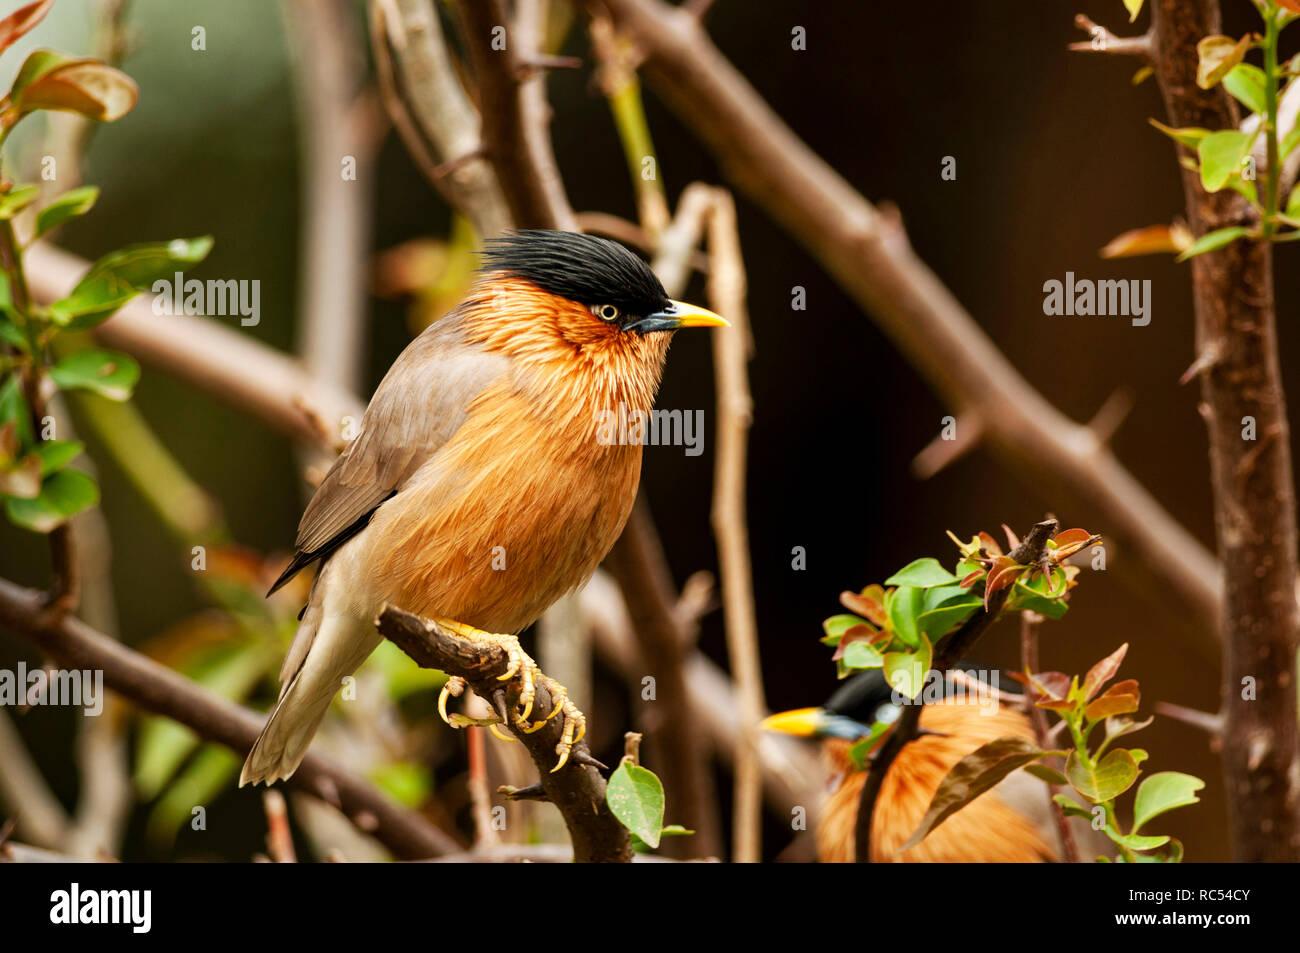 Brahminy starling, Sturnia pagodarum, Bharatpur, Rajasthan, India - Stock Image